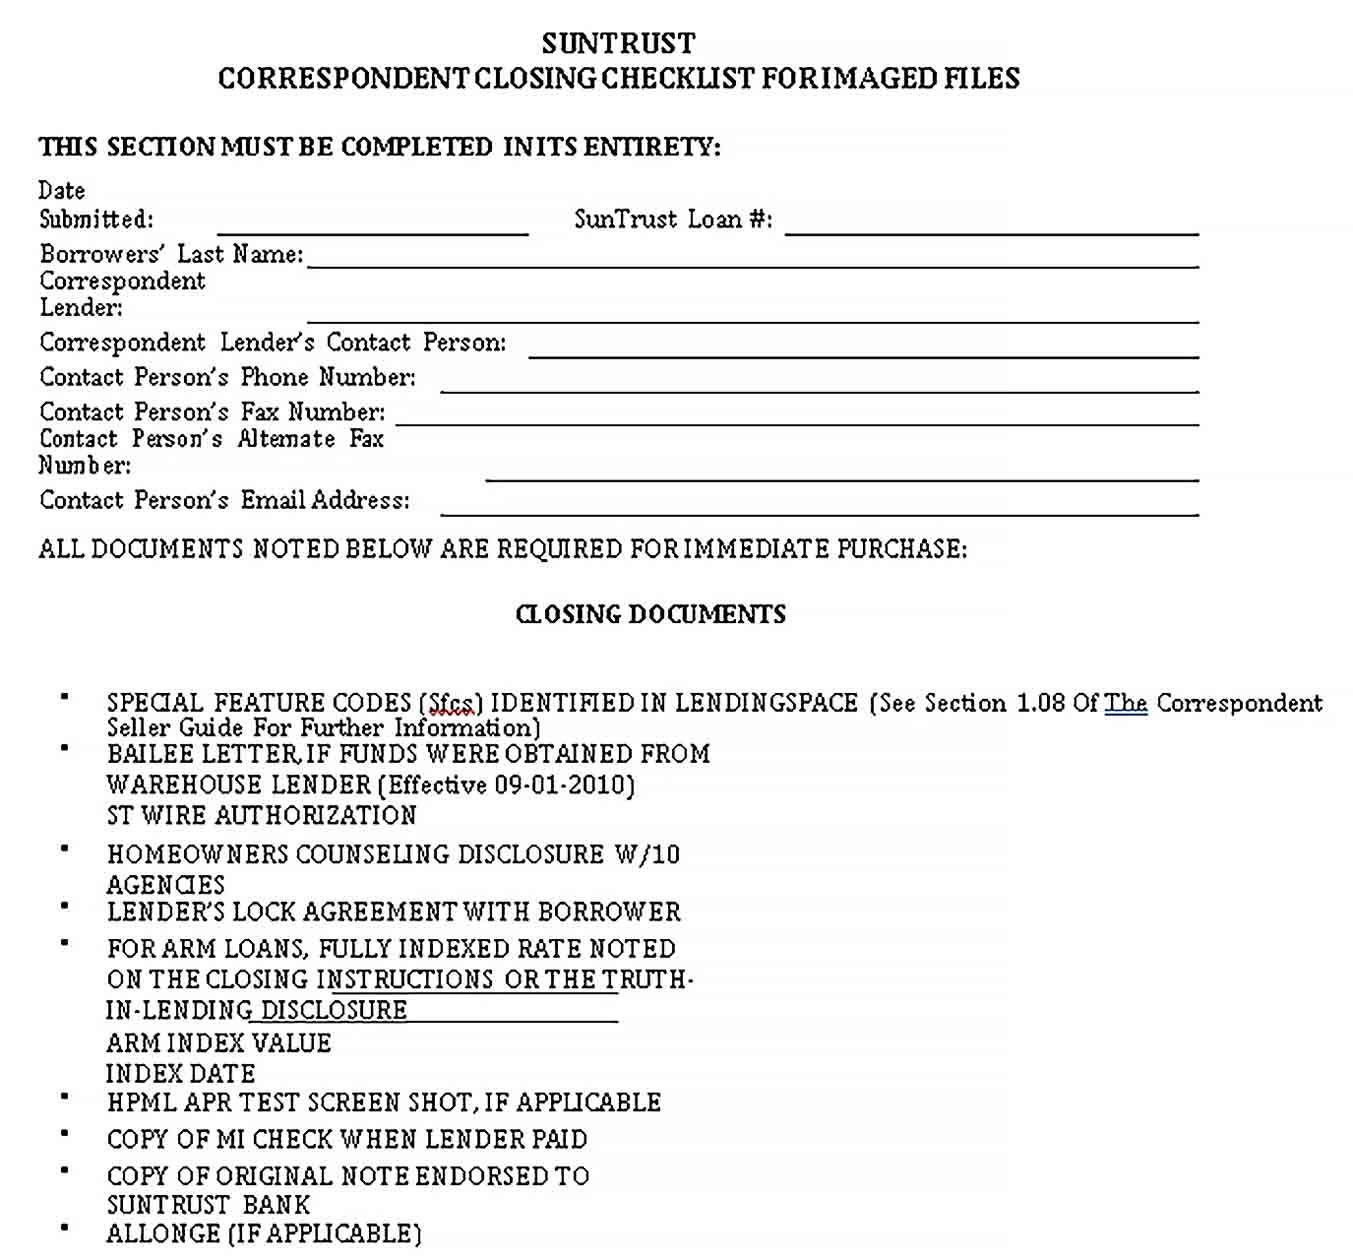 Closing Checklist Template Checklist Template Checklist Business Template Real estate closing checklist template